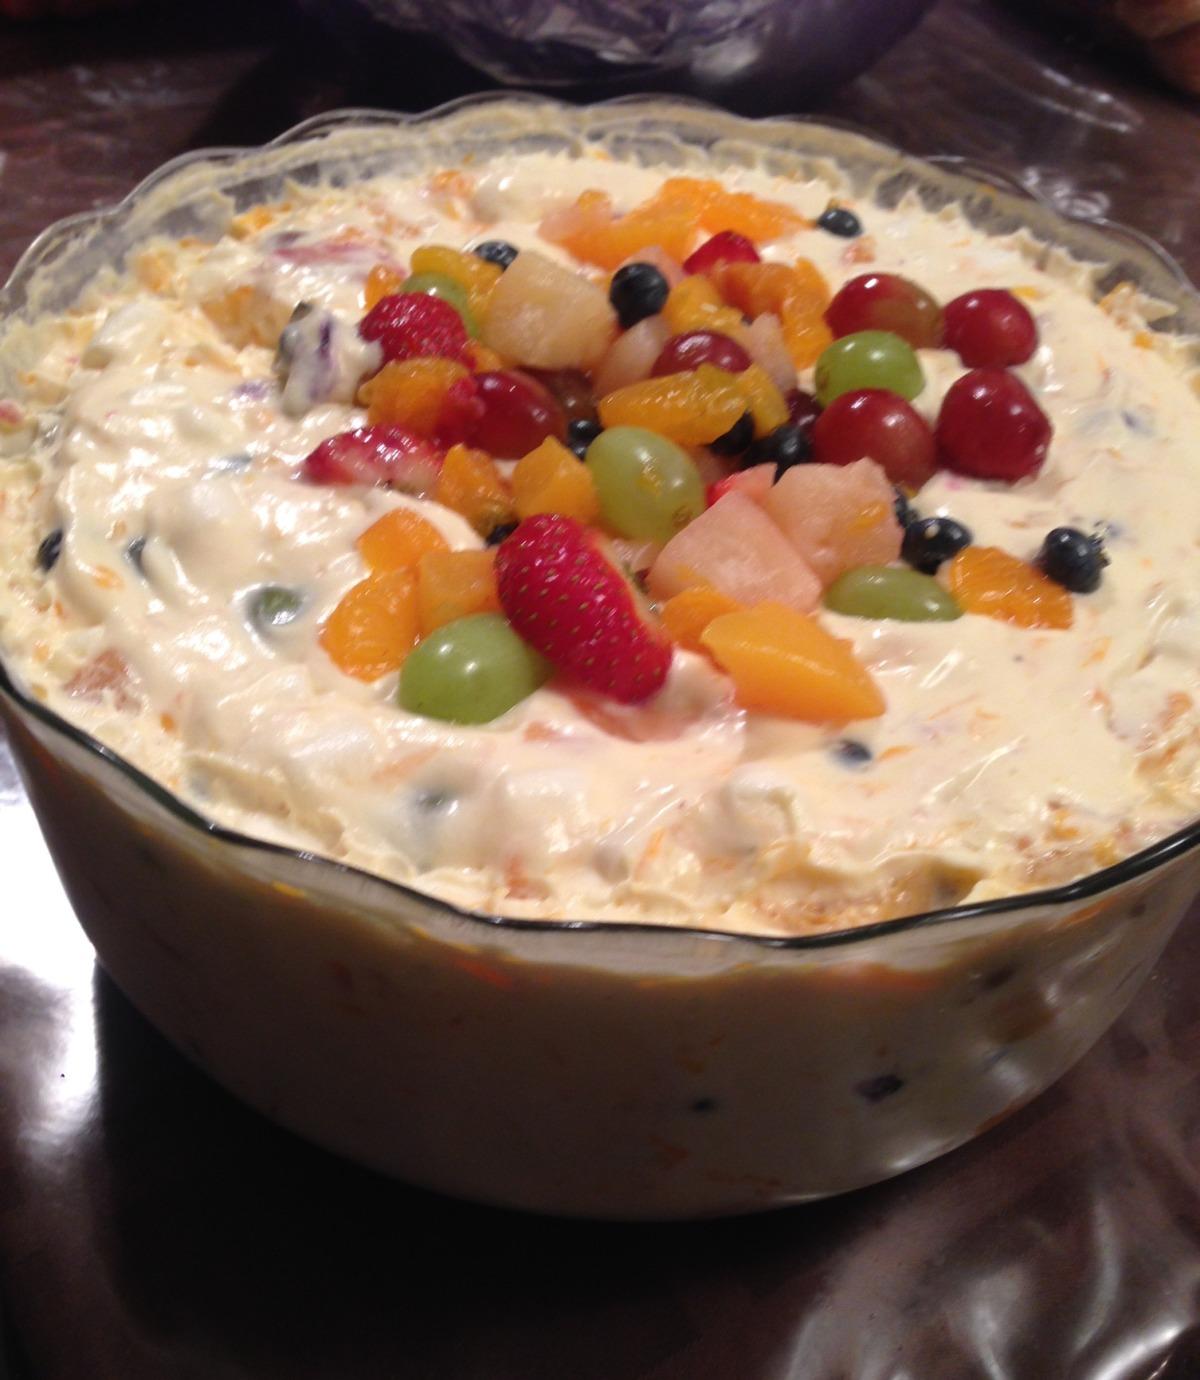 Super Creamy Fruit Salad image